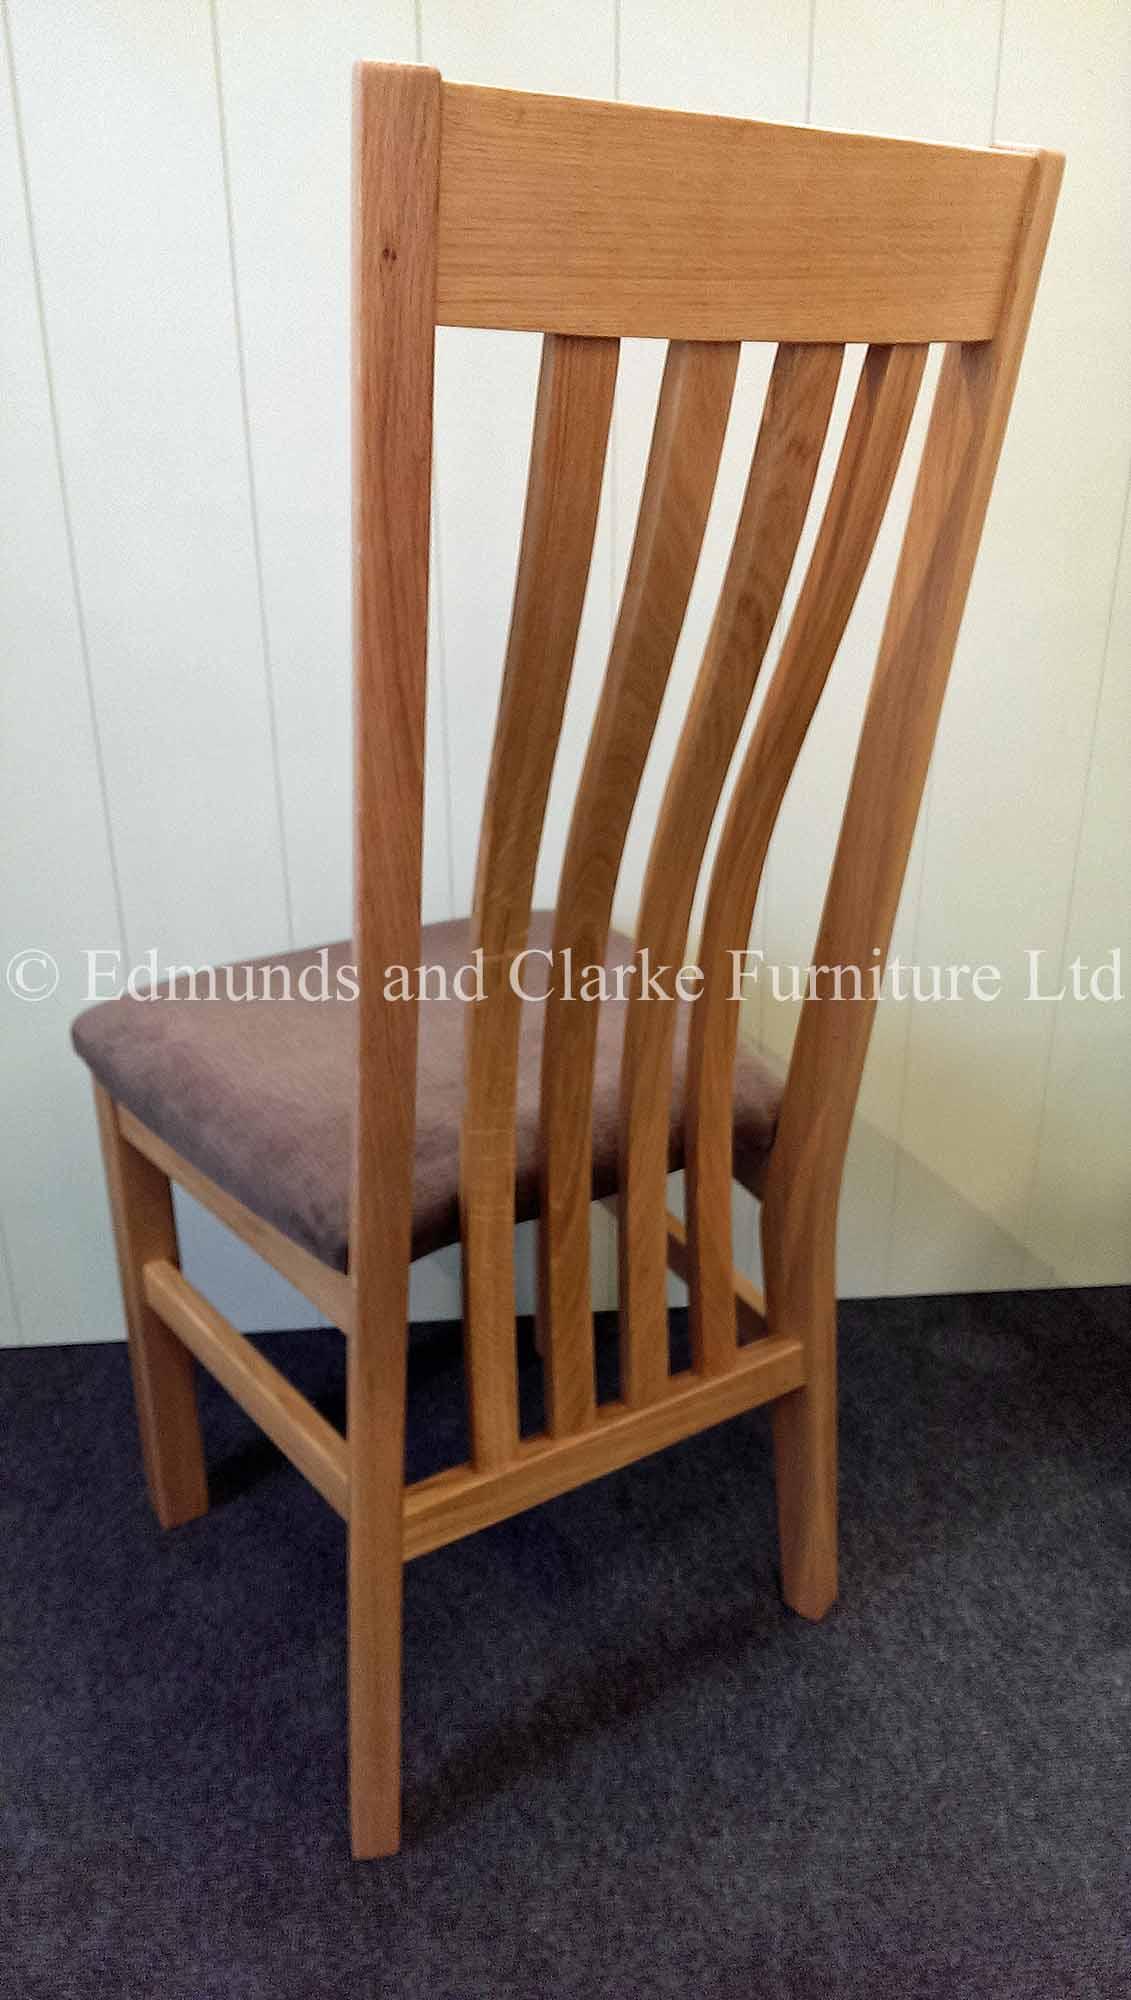 Harrington oak dining chair with velvet seat pad light brown